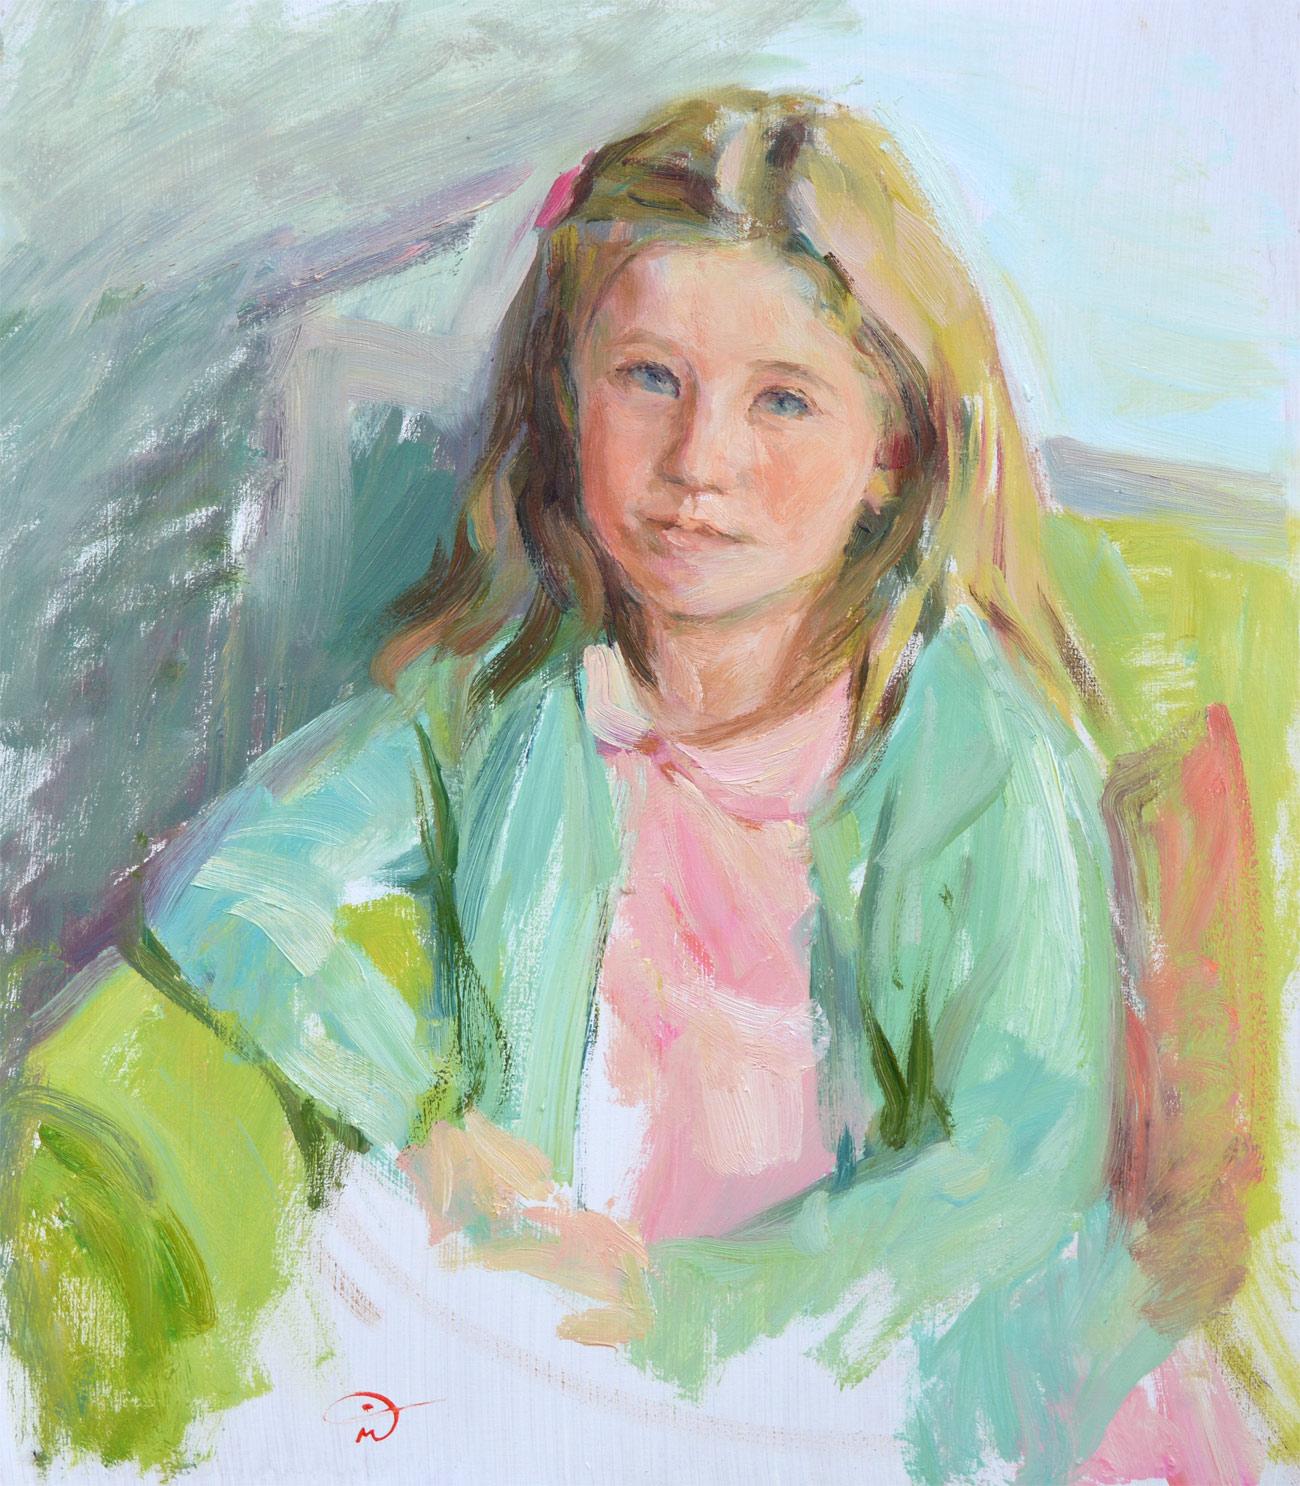 Emily. Portrait study in oil on board. Portrait commission portfolio of the British artist Marina Kim